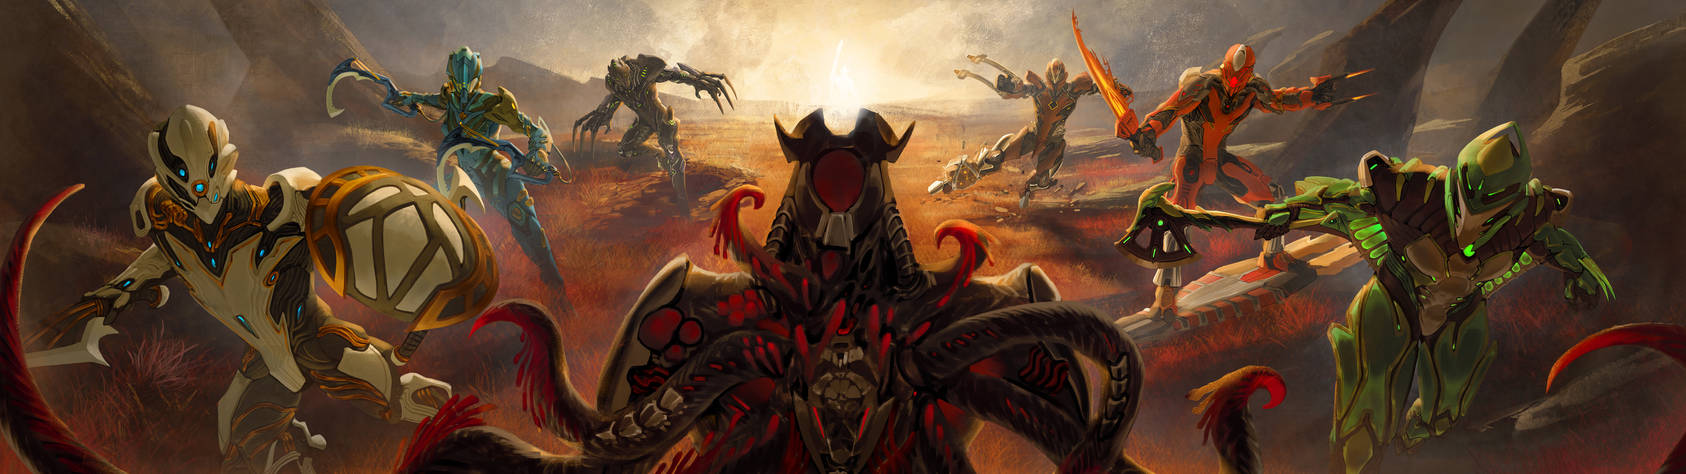 Warframe Bionicle crossover